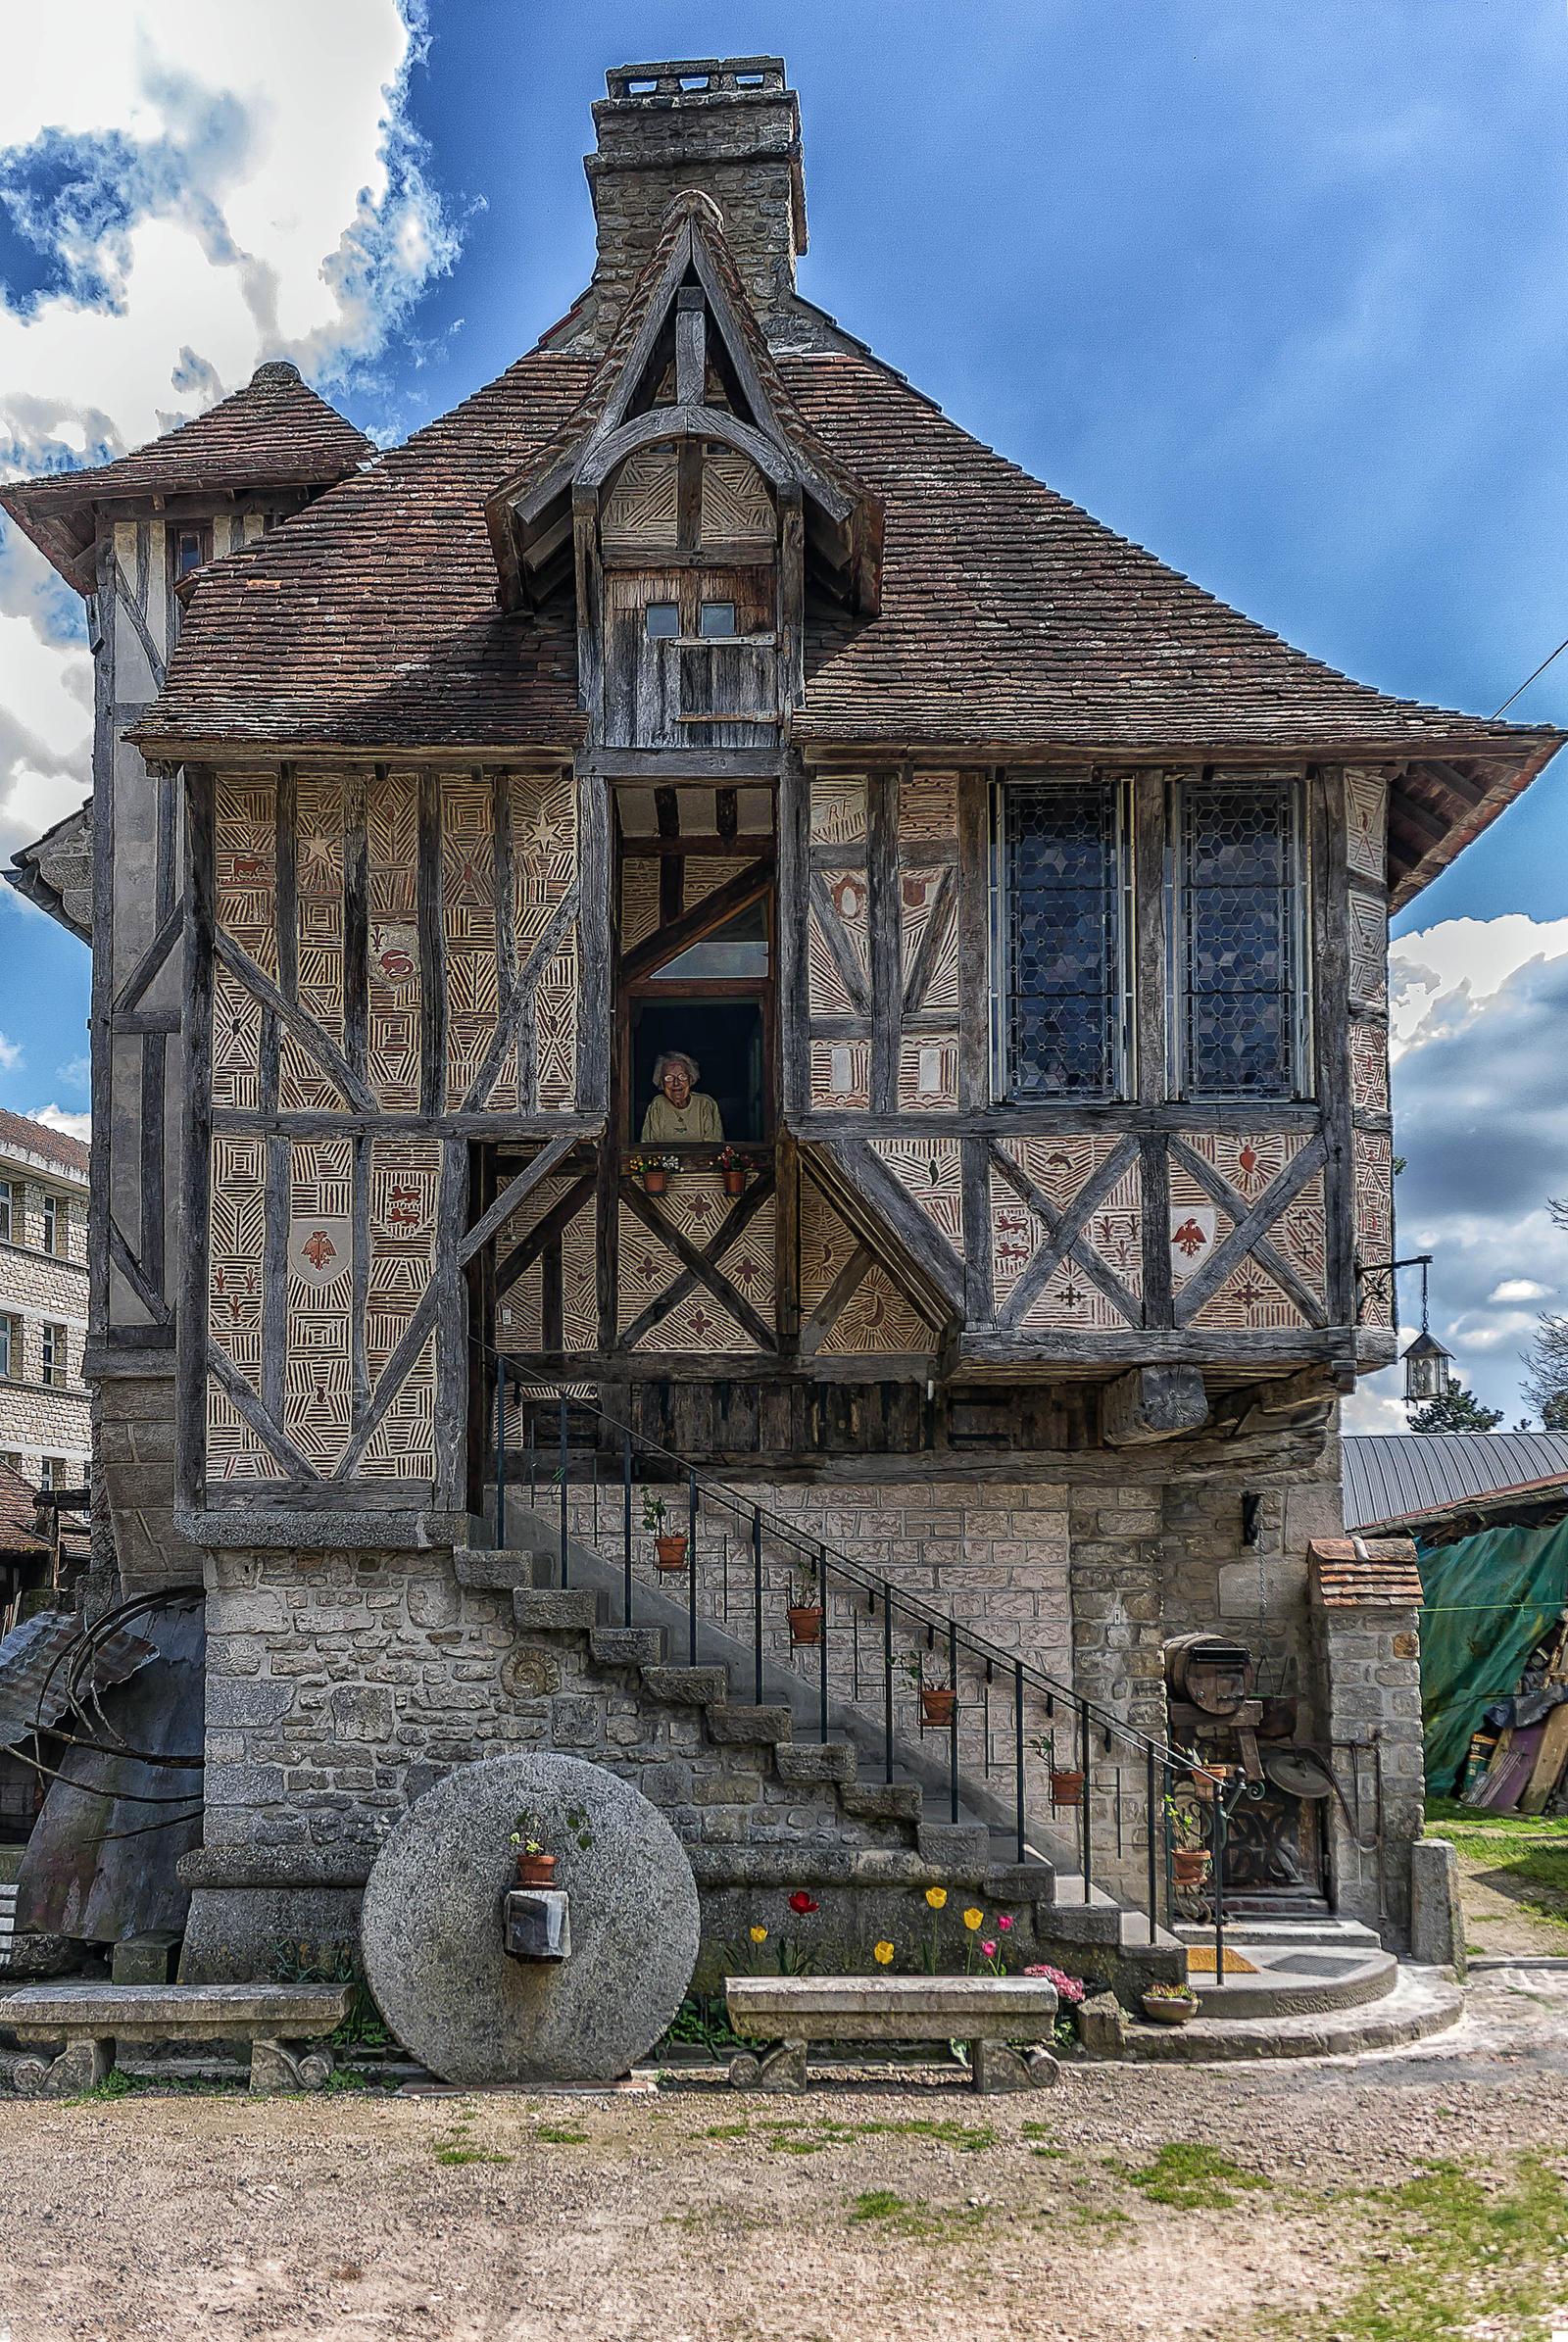 House Argentan Orne France by hubert61